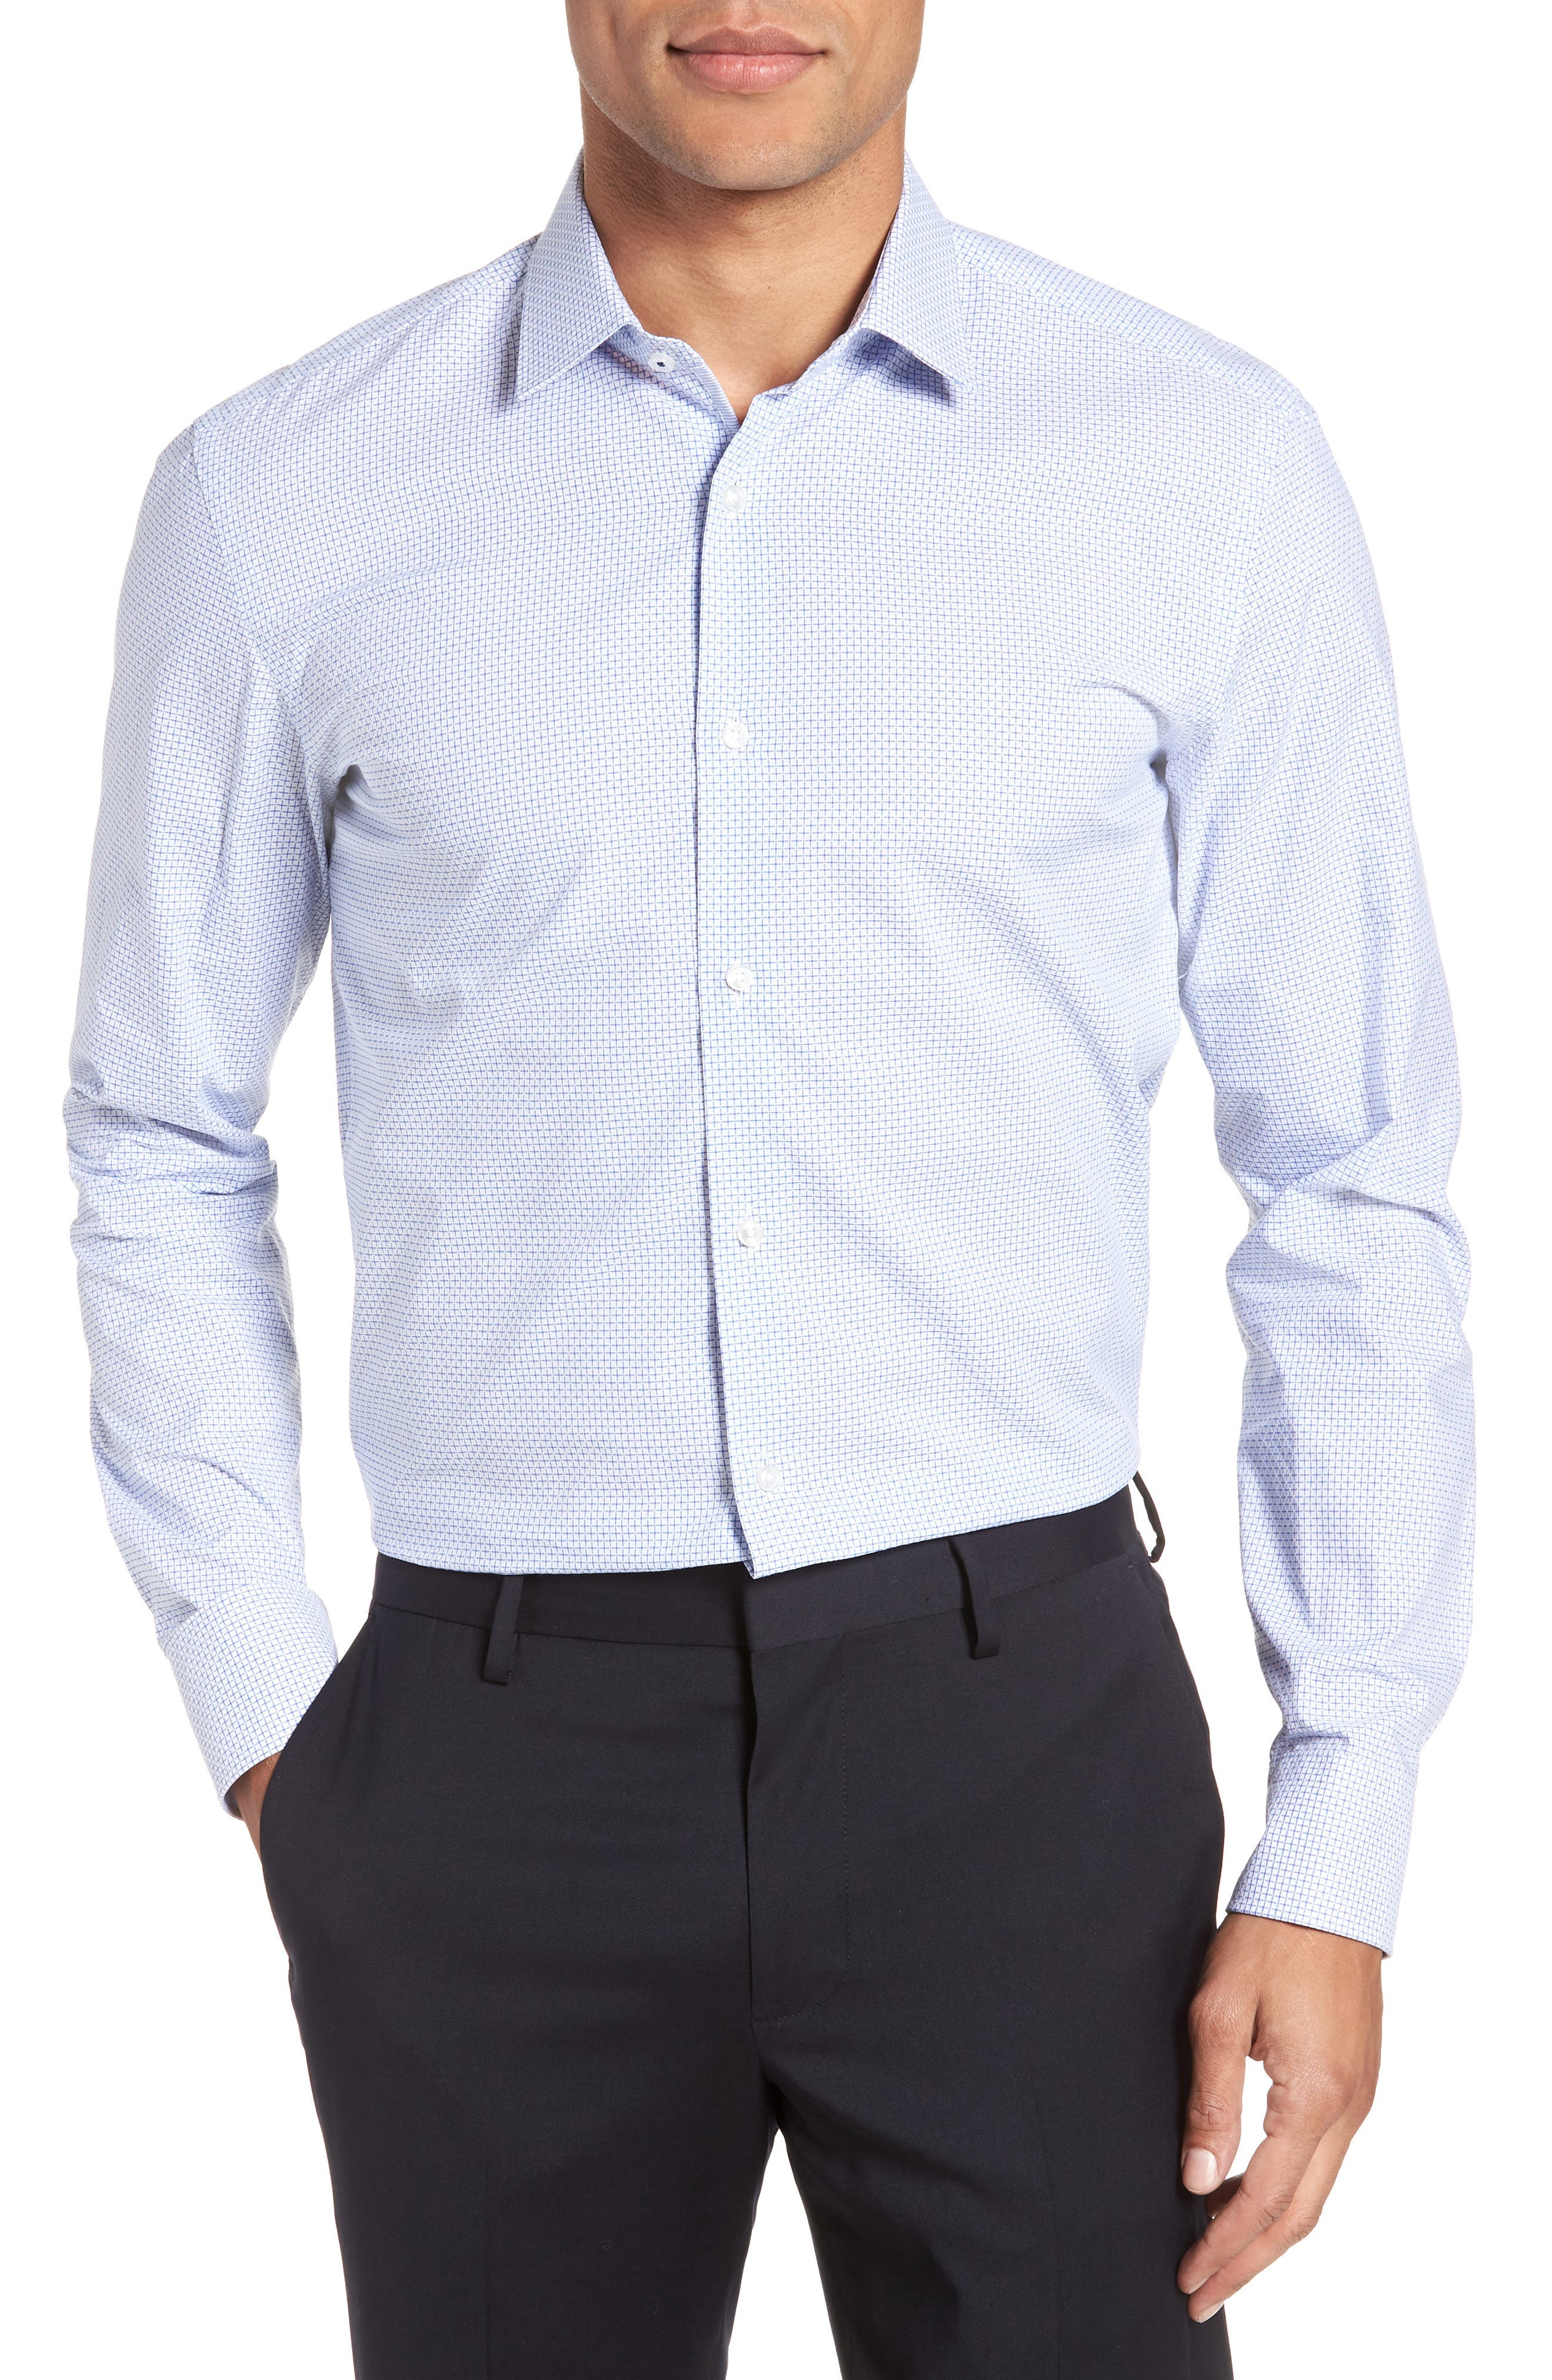 Jesse Slim Fit Check Dress Shirt,                         Main,                         color, 431